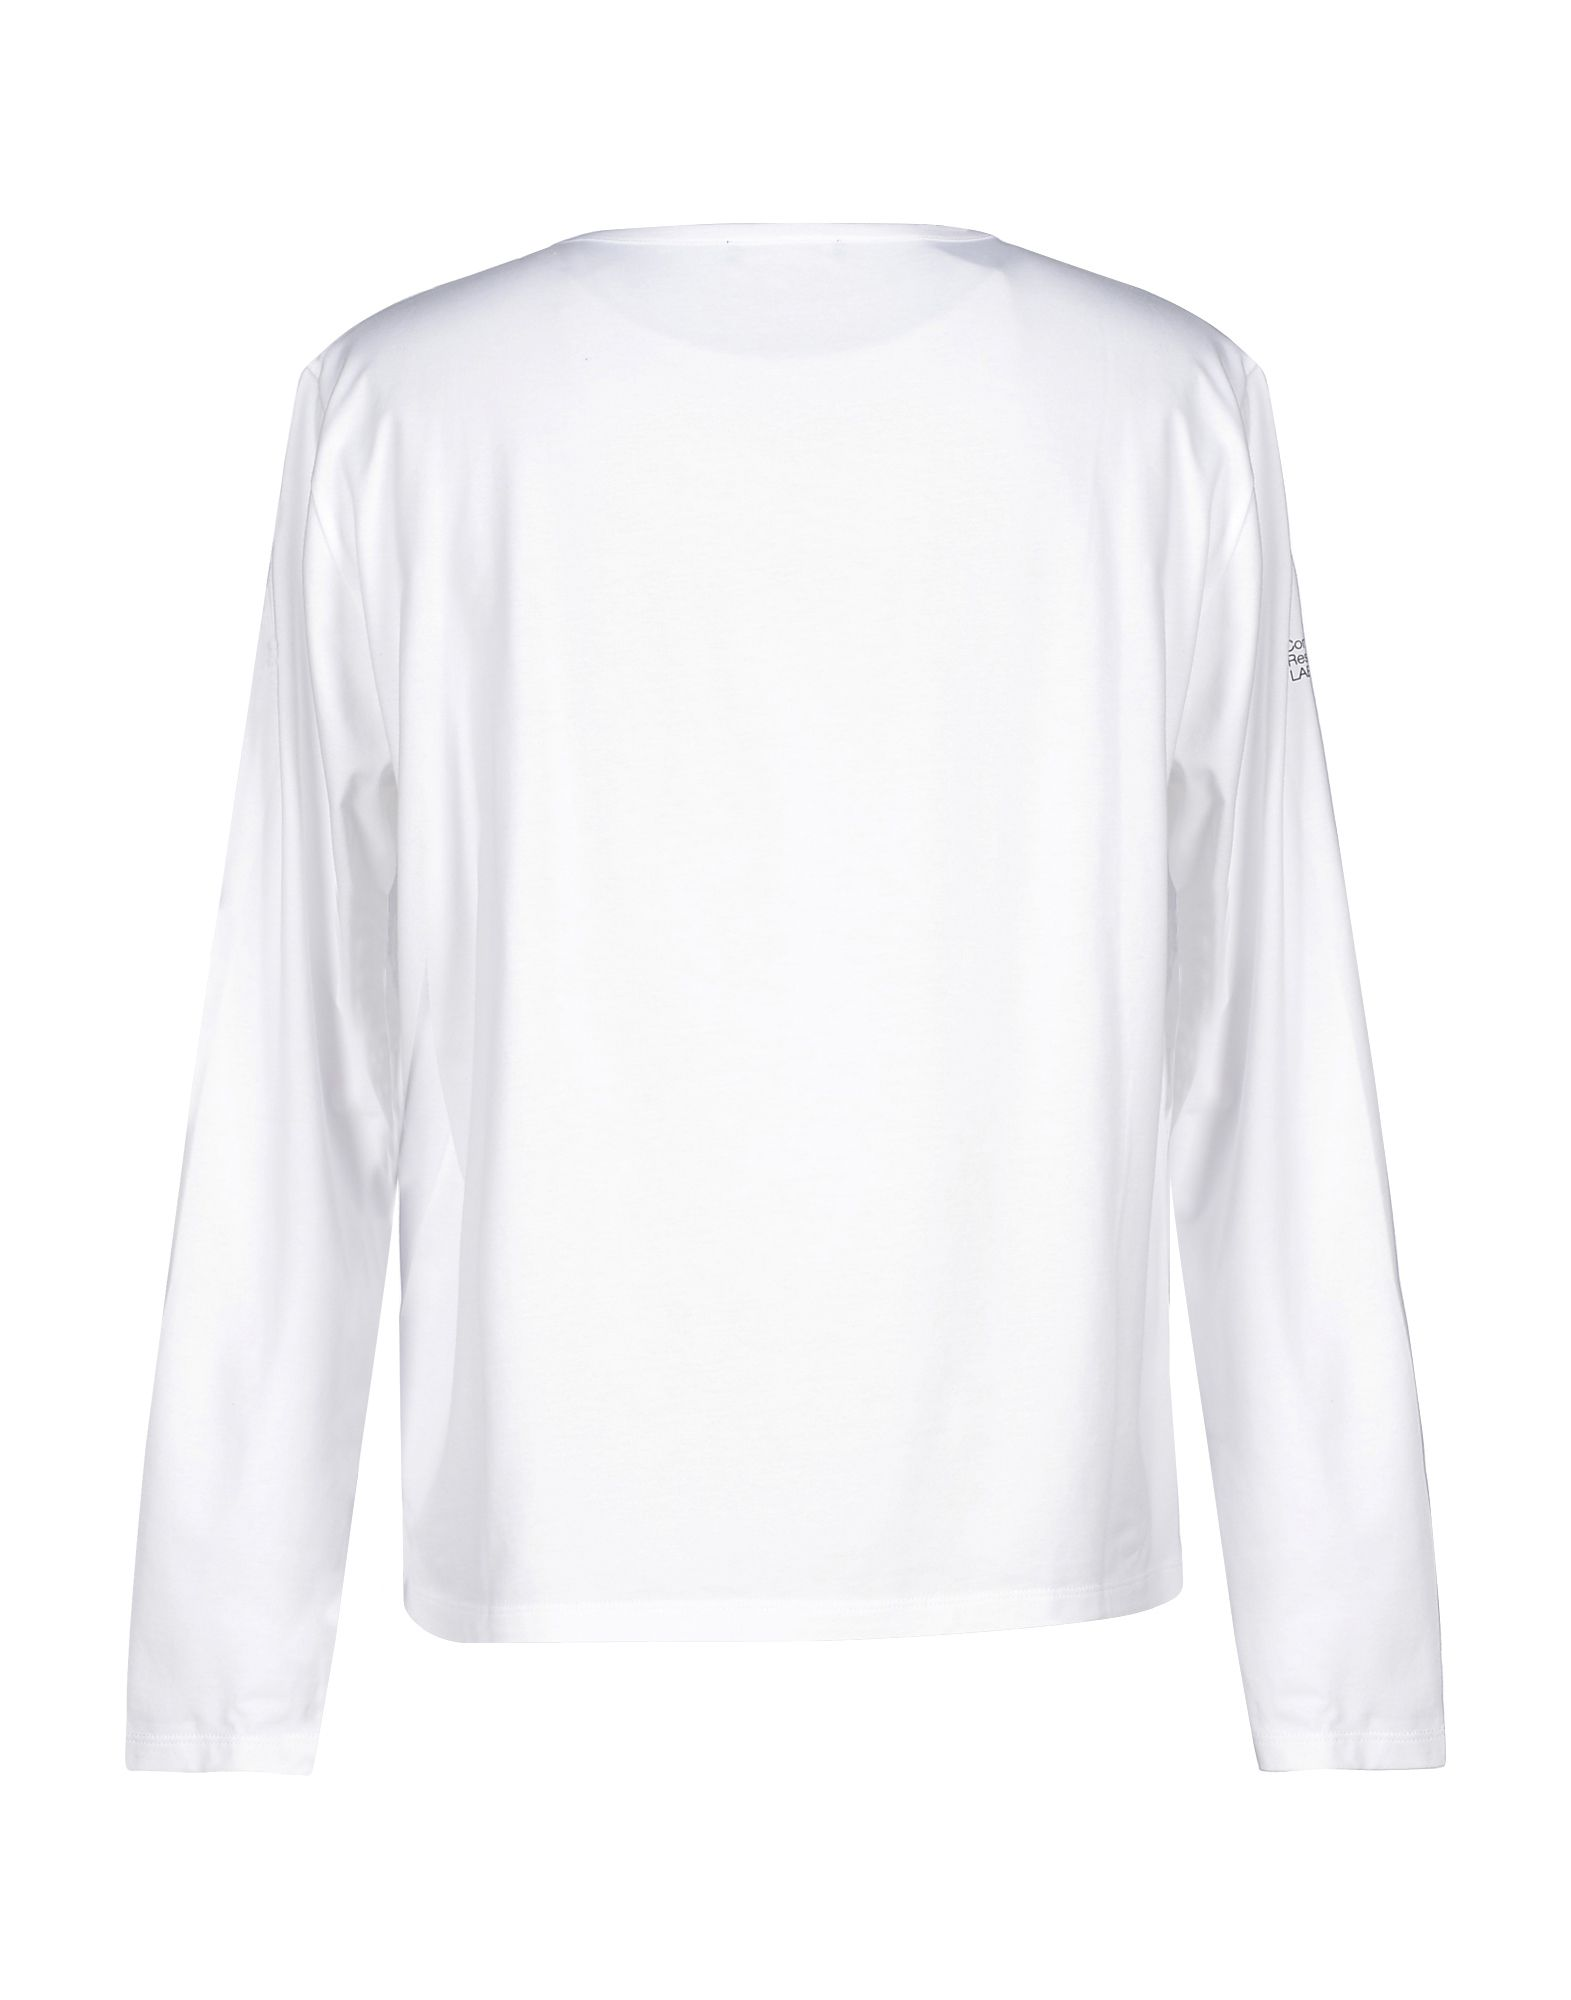 T-Shirt 37858020XB Lab. Pal Zileri Uomo - 37858020XB T-Shirt 3bb88d